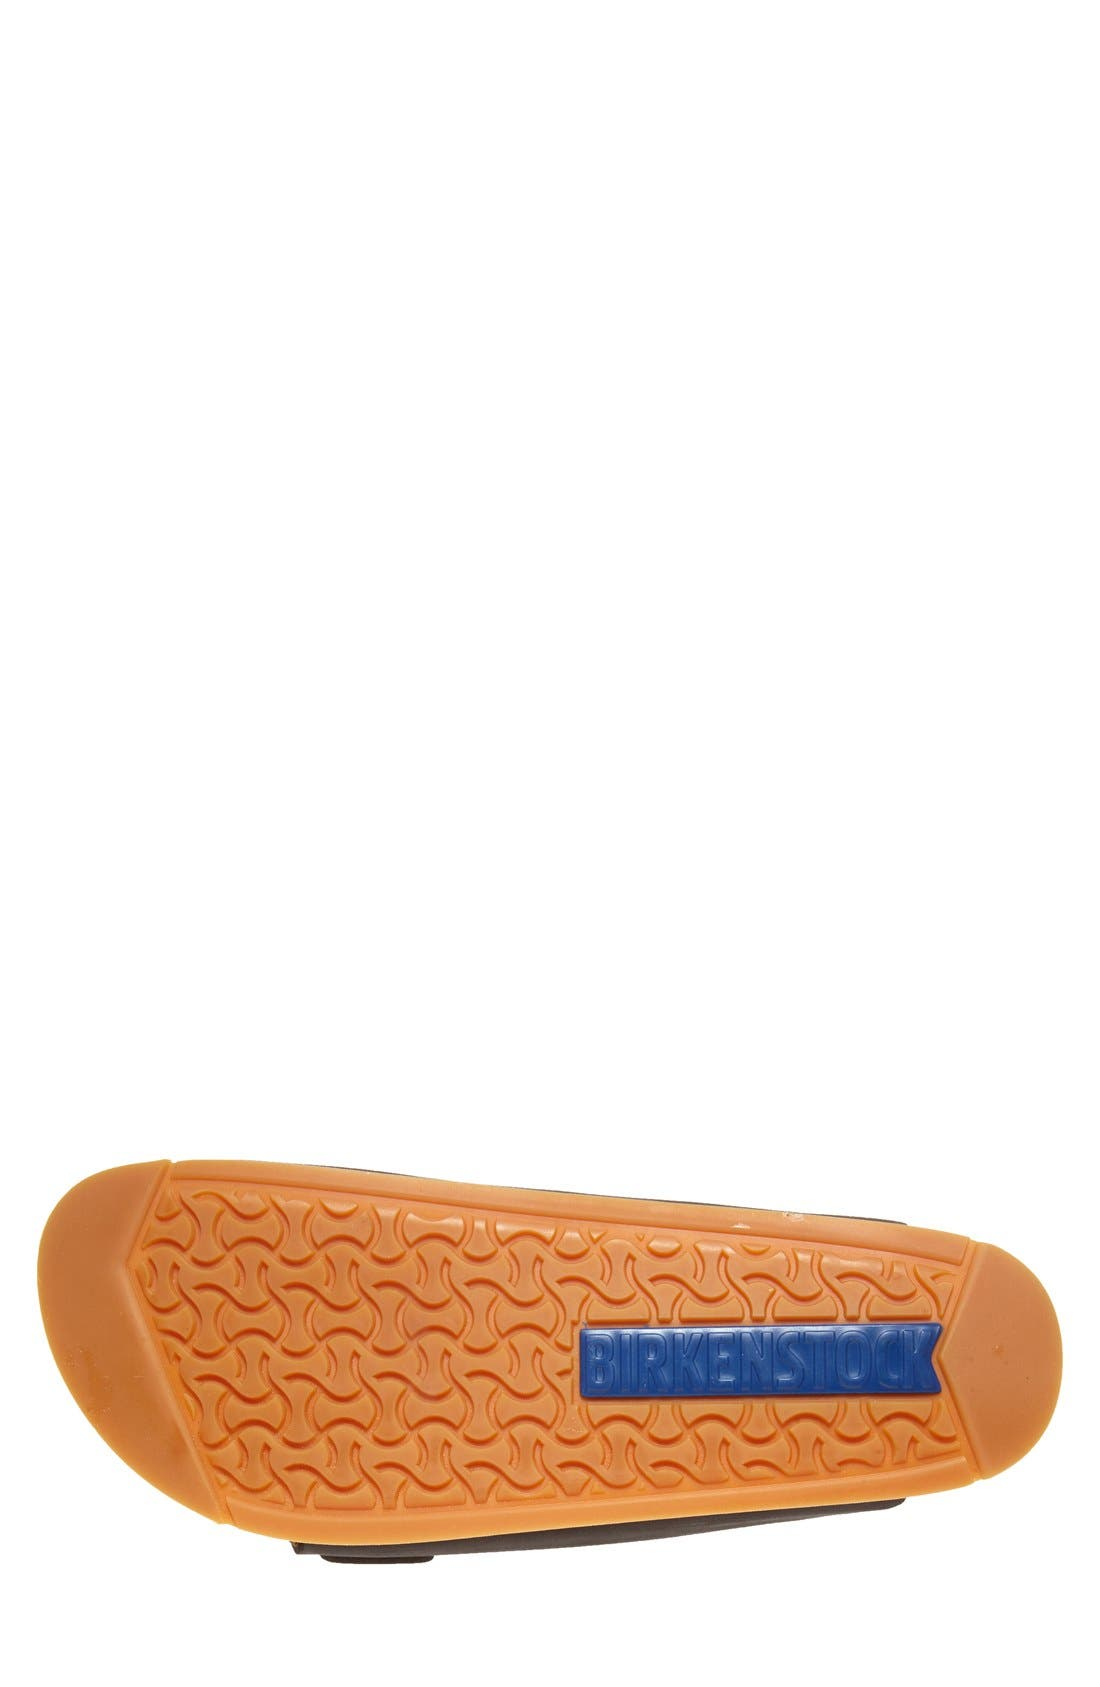 BIRKENSTOCK, 'Arizona' Leather Slide Sandal, Alternate thumbnail 3, color, 001